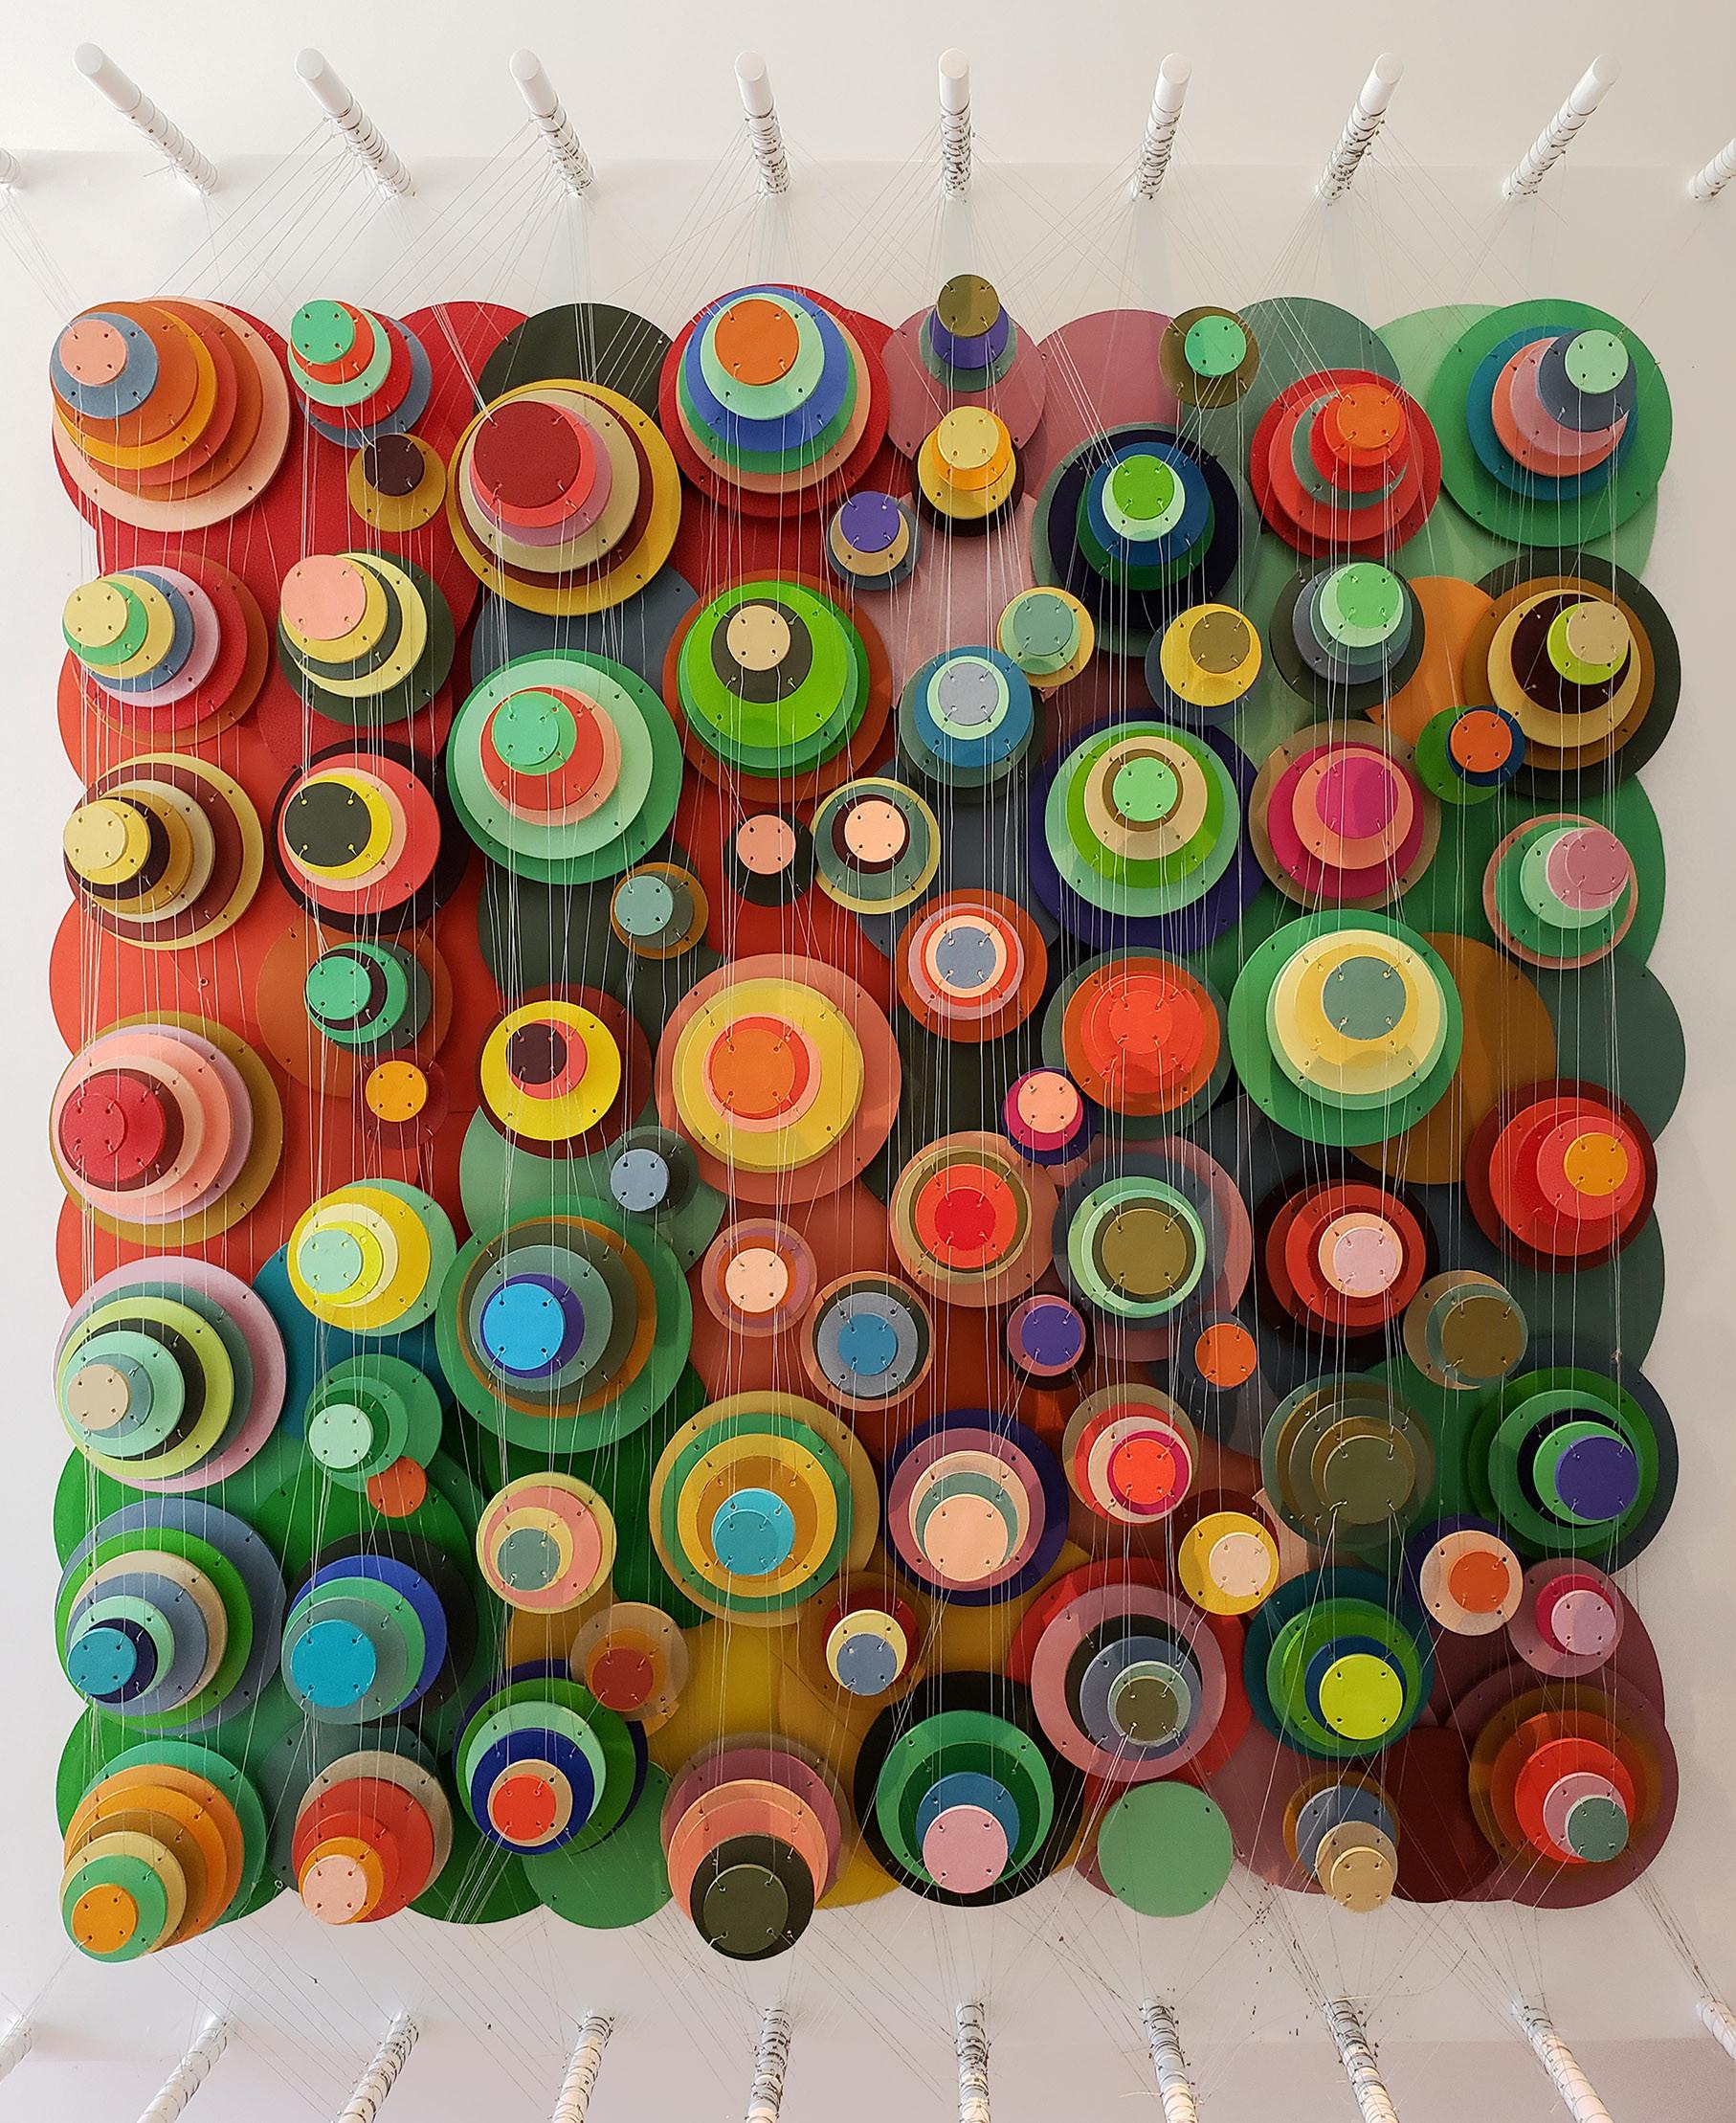 Cecilia Glazman Multicolor popps 2018 Papel y madera pintados a mano e hilos (Hand painted paper and wood, thread) 100 x 100 cm.